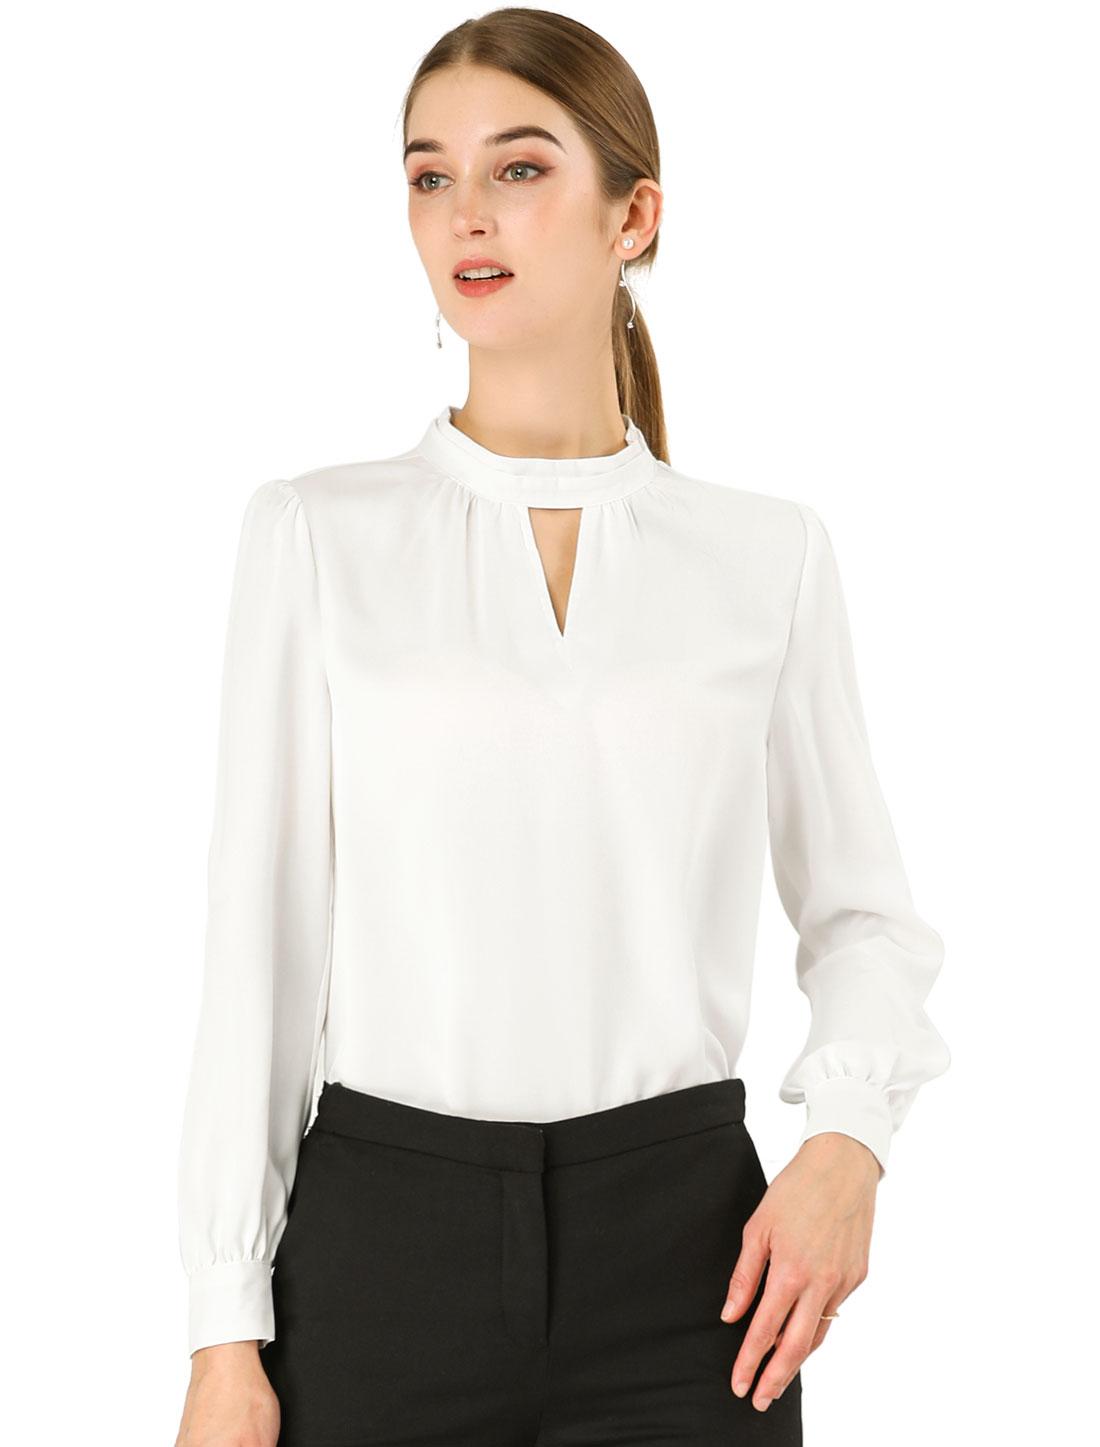 Allegra K Women's Keyhole Stand Collar Long Sleeve Blouse White L (US 14)